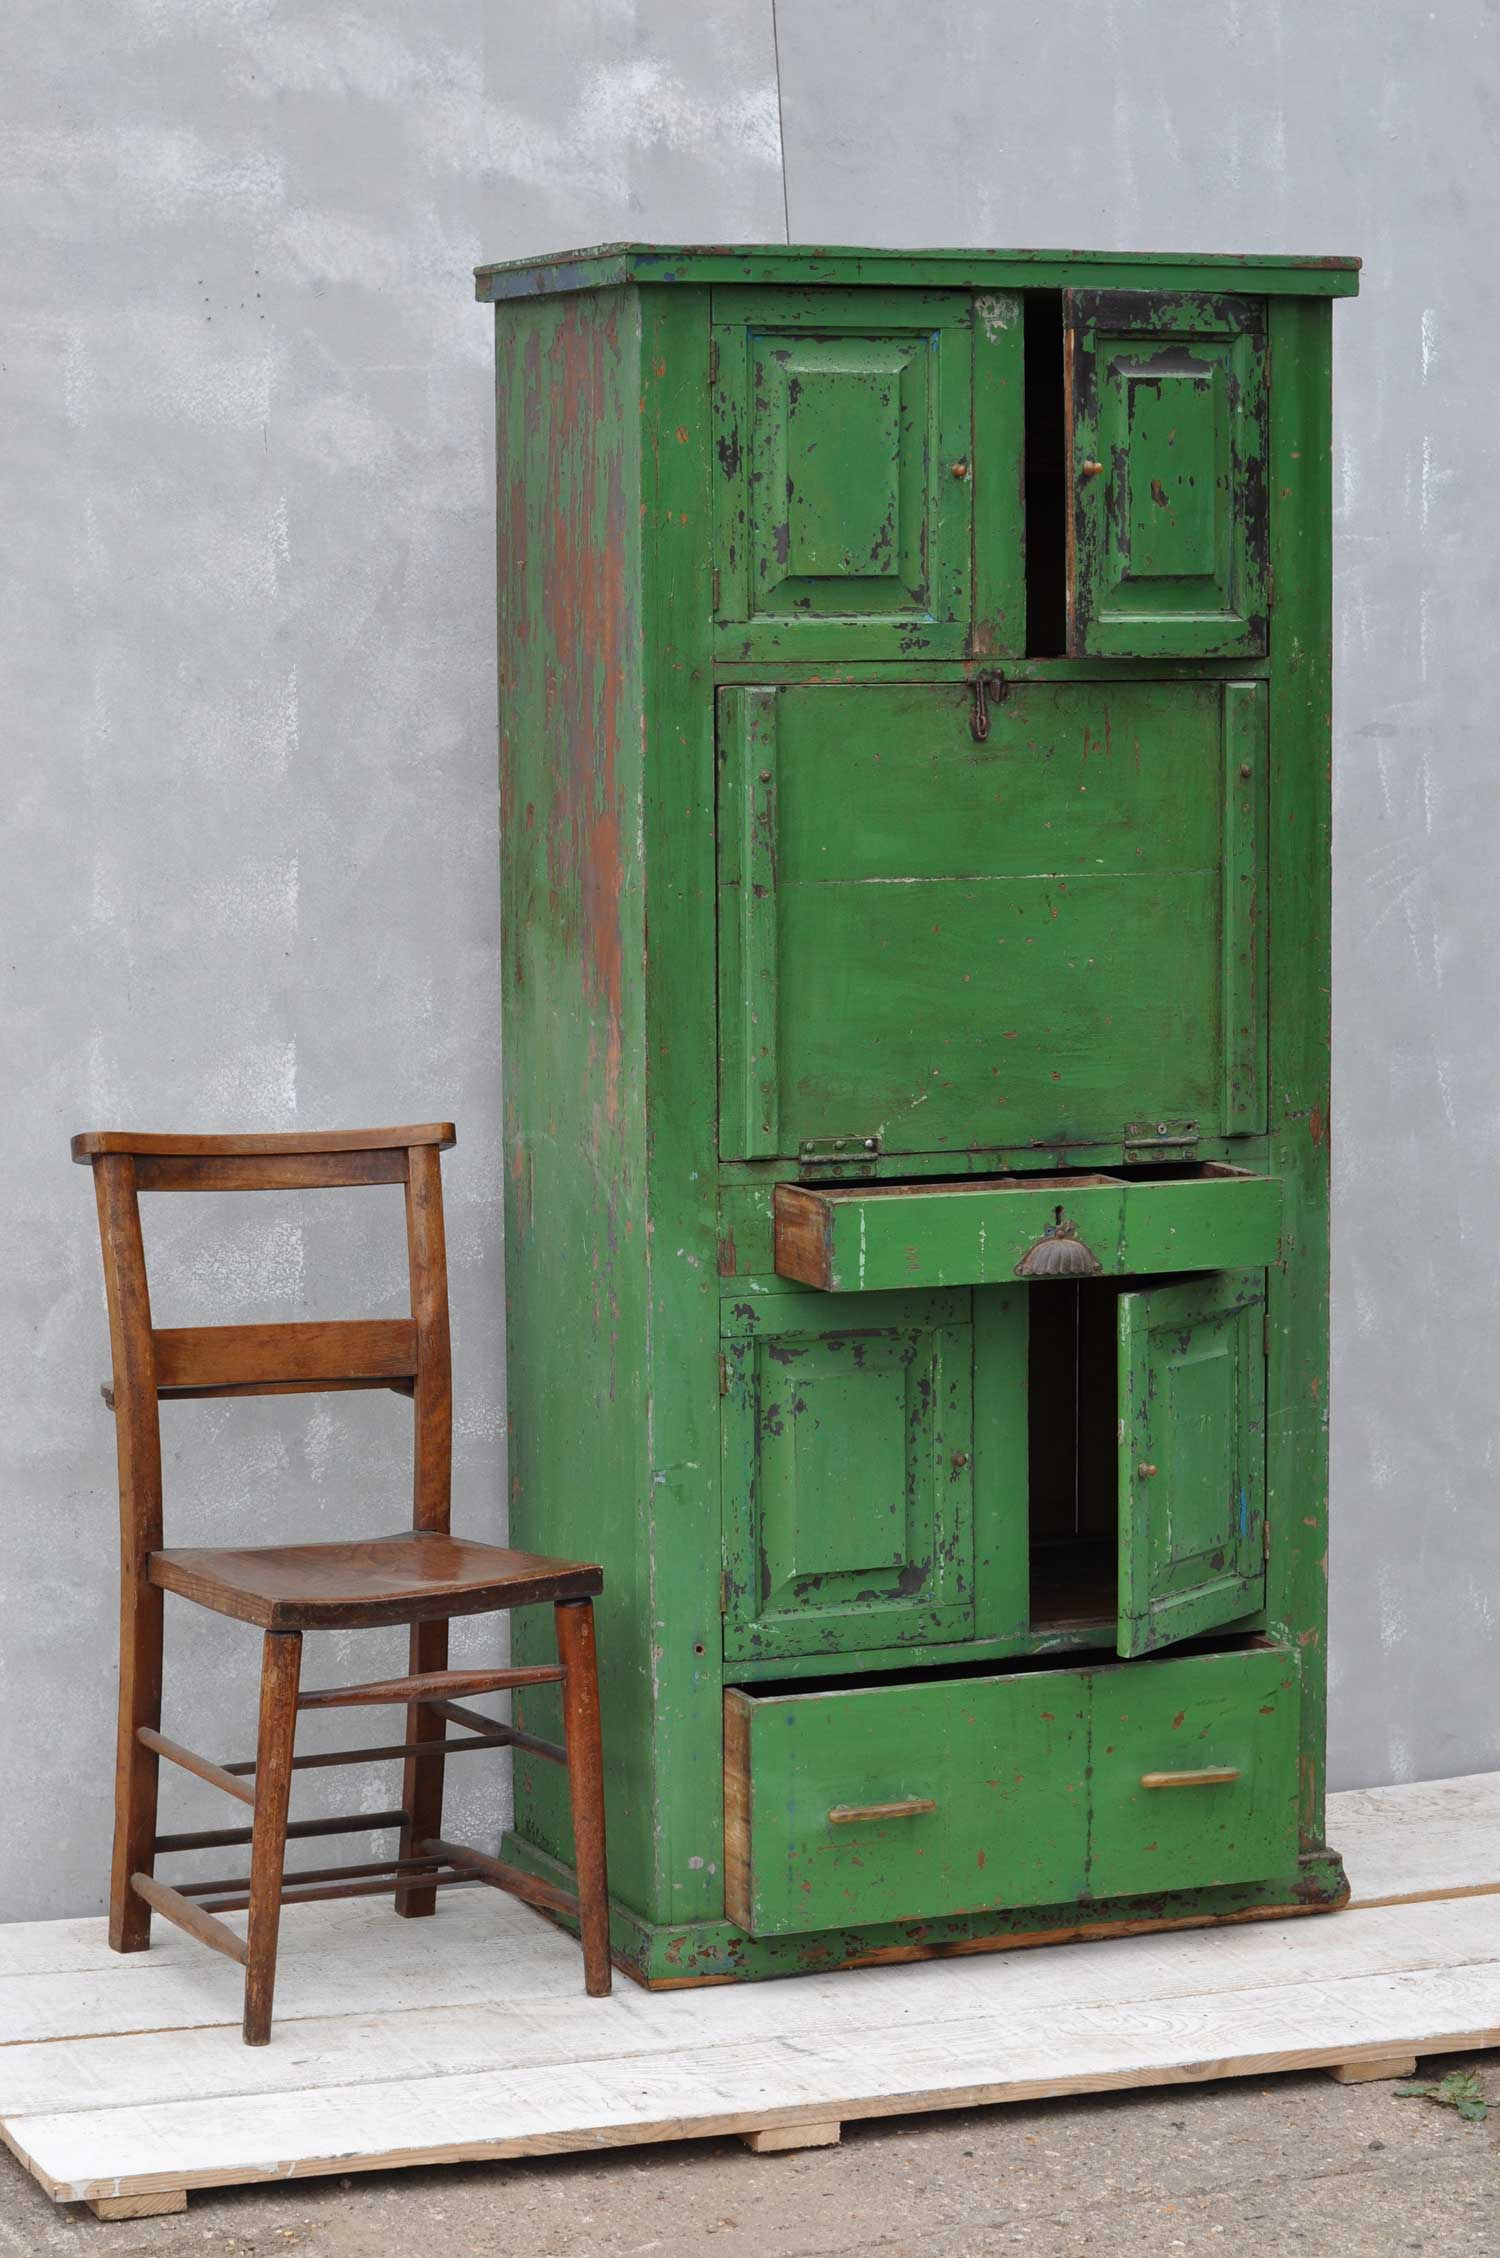 Rustic Vintage Bureau Tall Cabinet Original Green